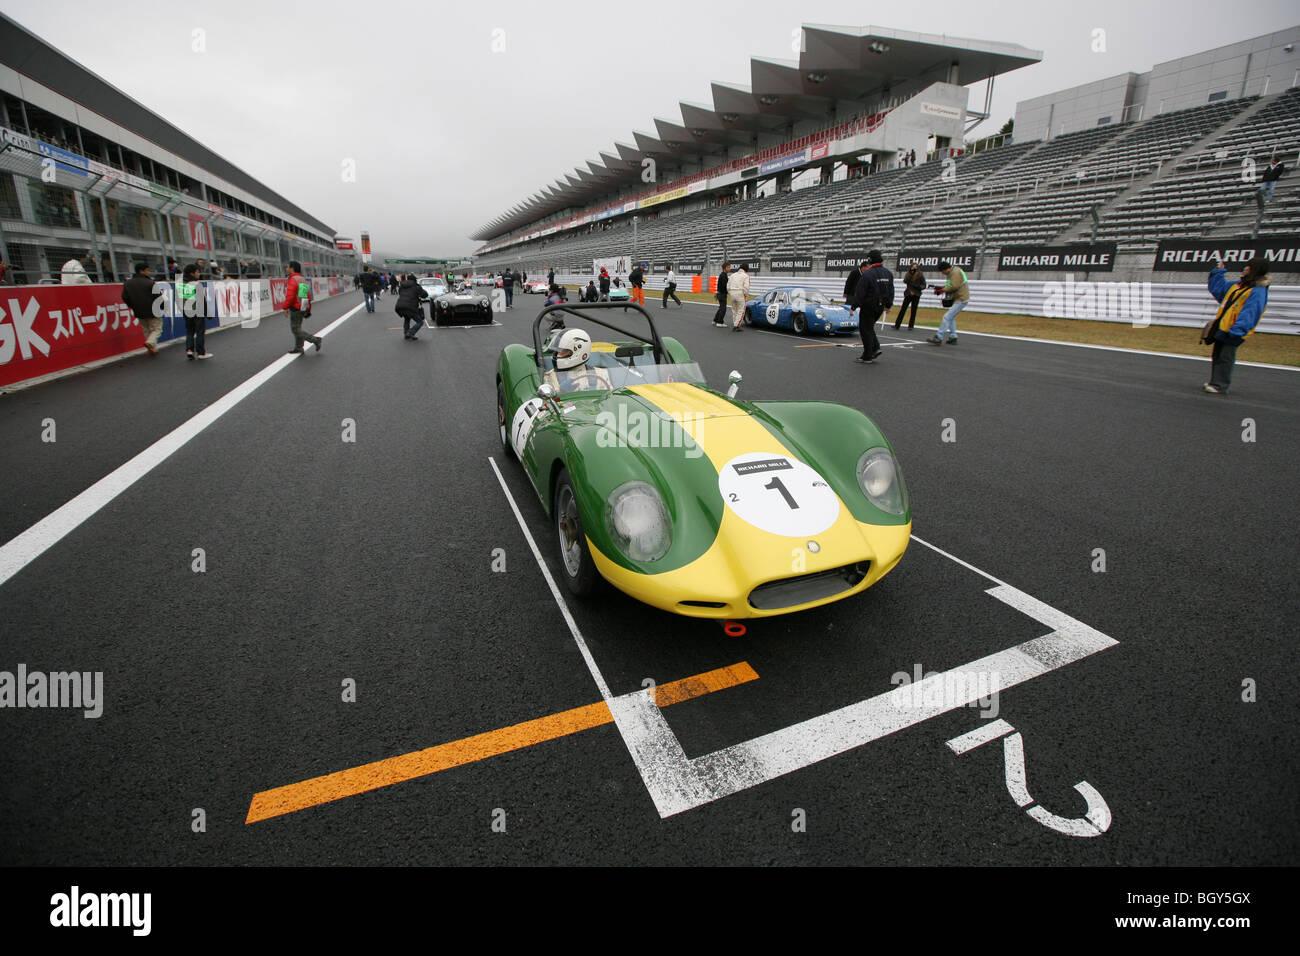 1958 Lister Jaguar. Le Mans Classic car race, Fuji Speedway, Japan, Saturday, November 10th, 2007.